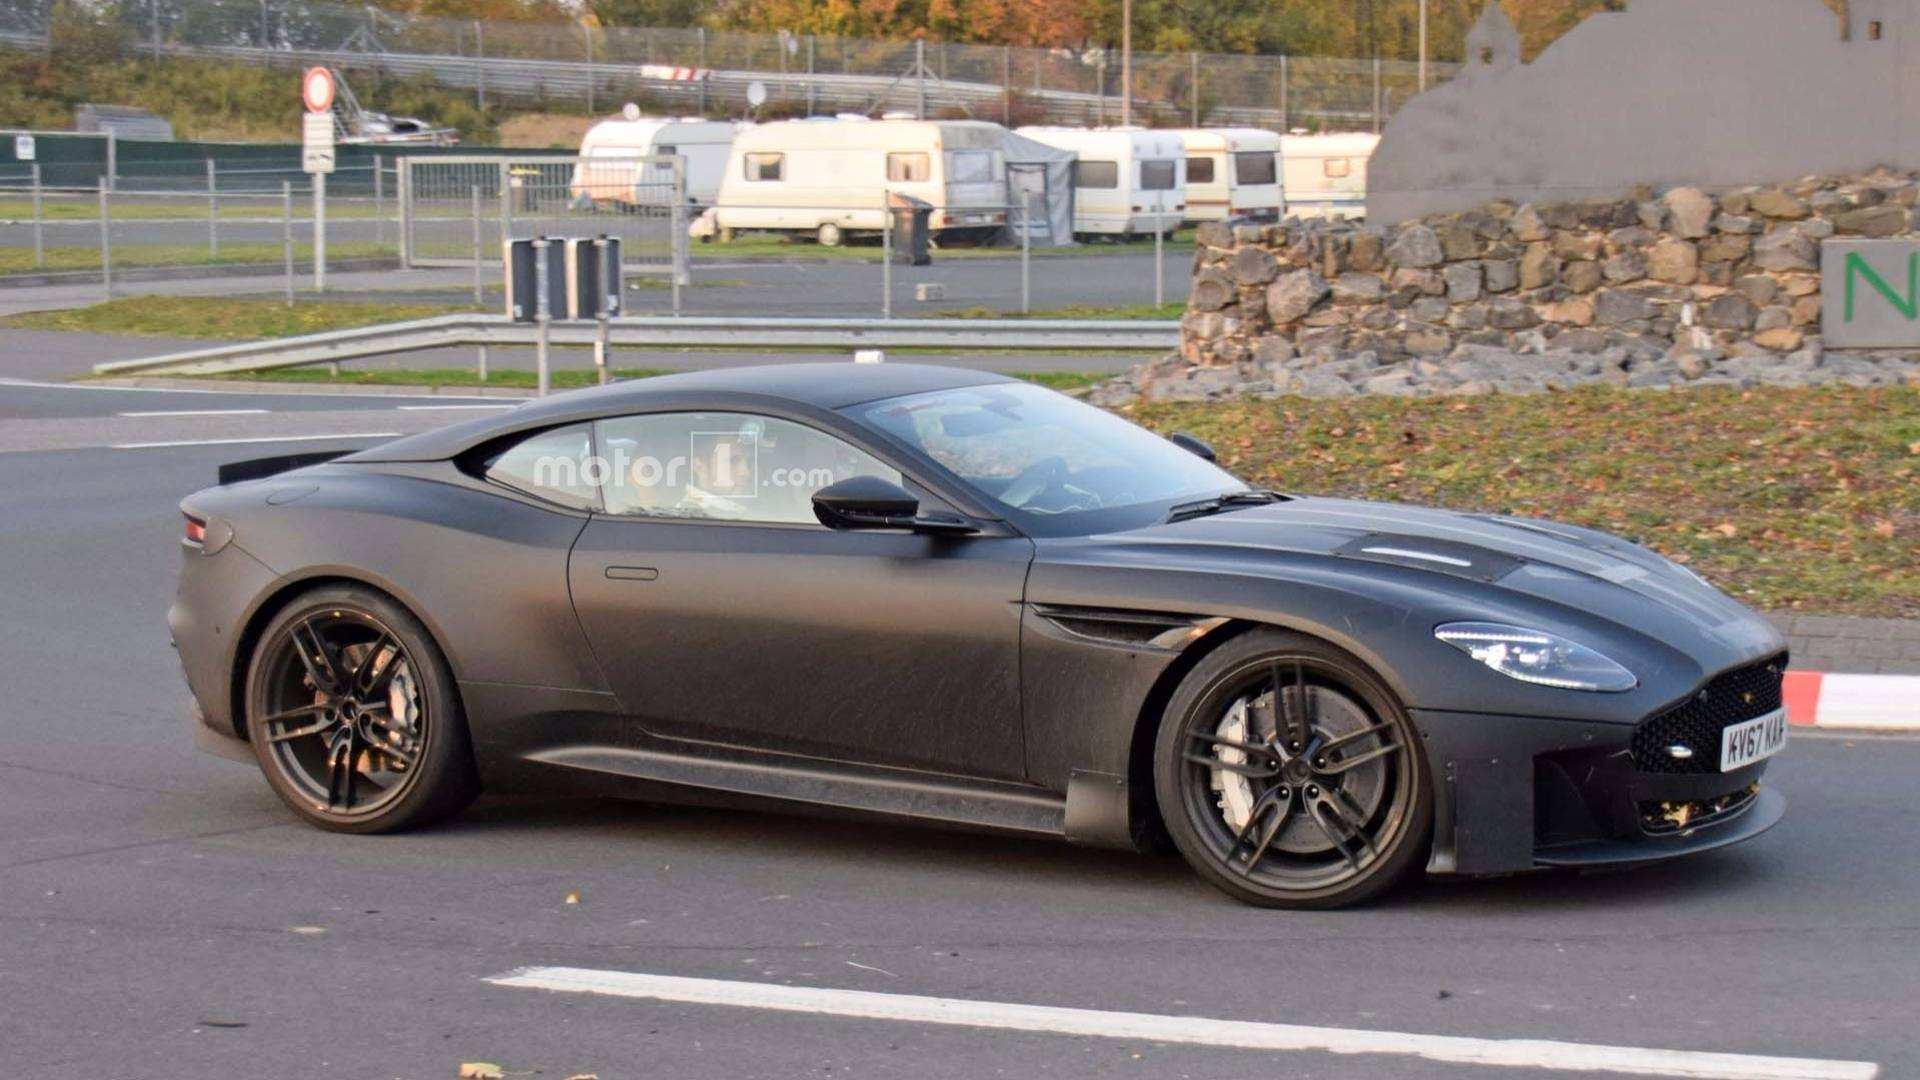 97 All New 2019 Aston Martin Vanquish Speed Test for 2019 Aston Martin Vanquish